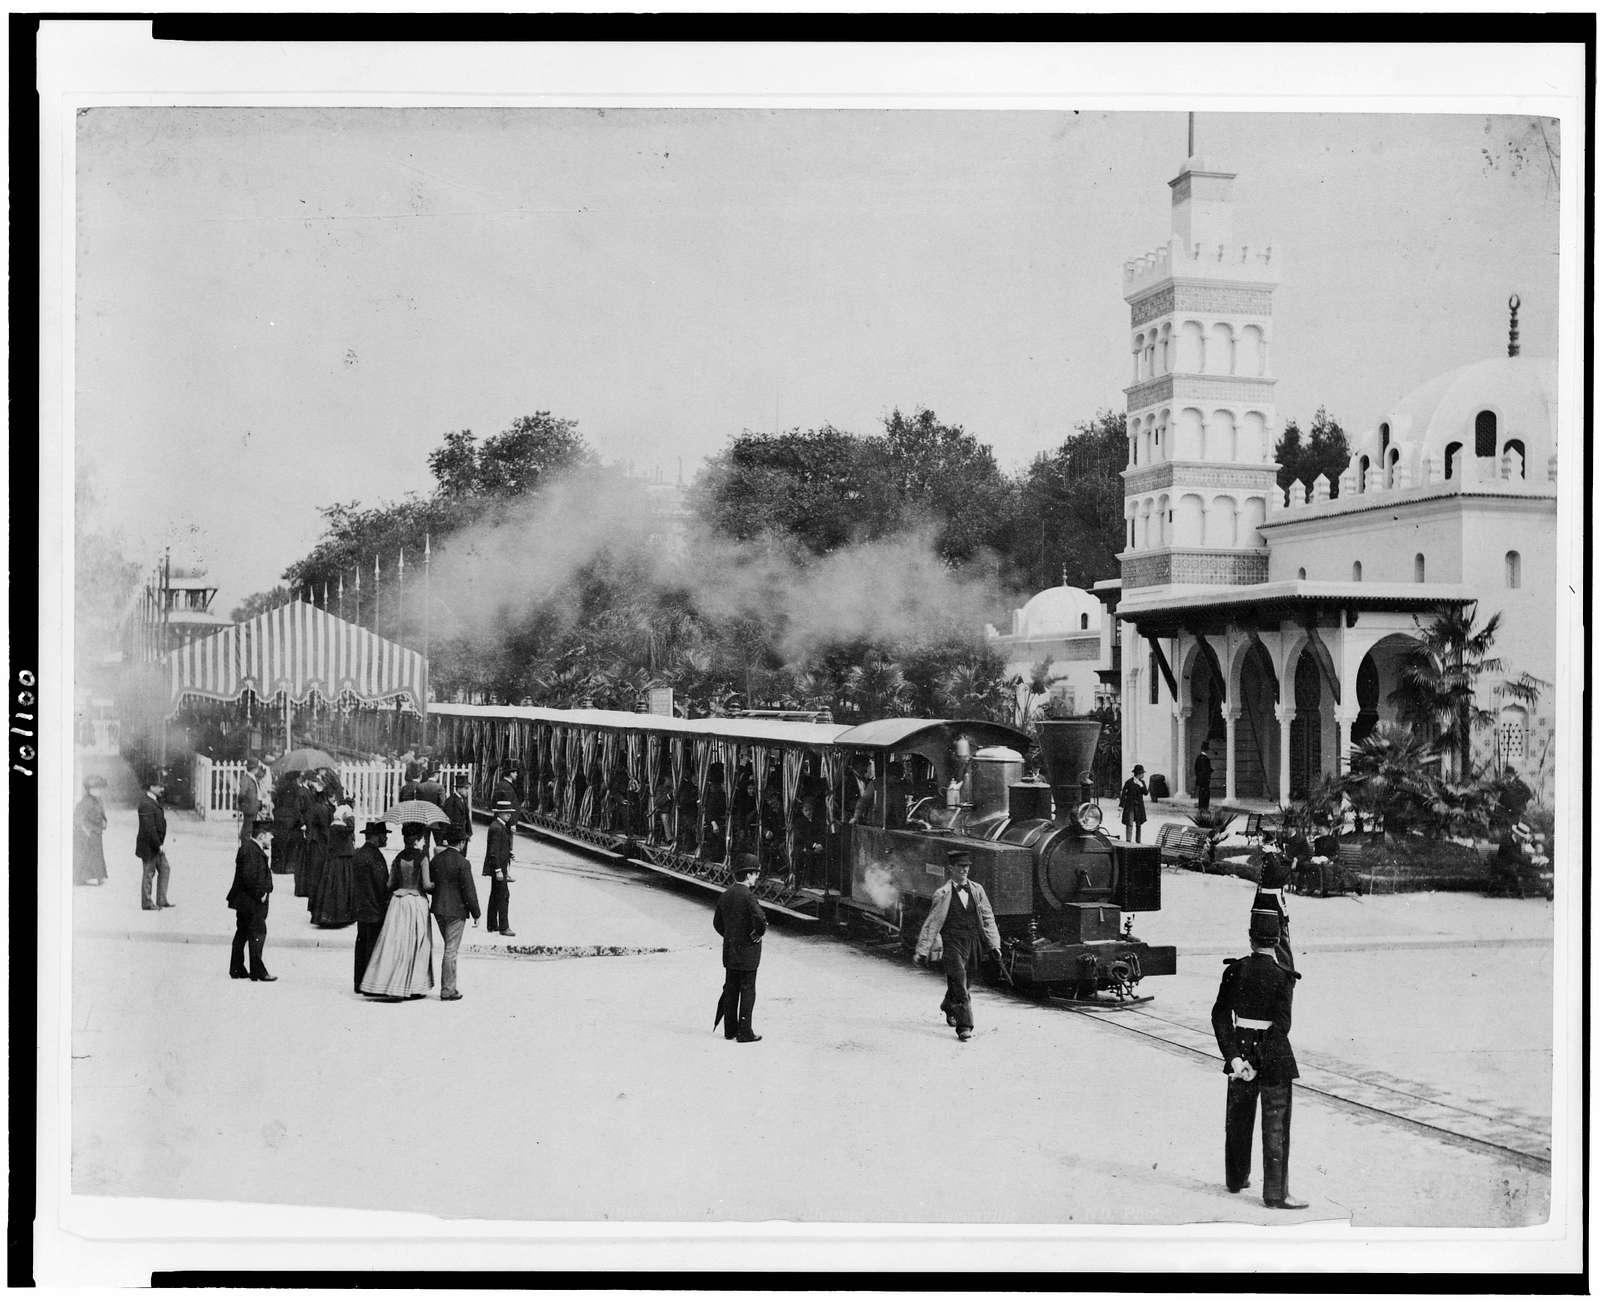 [Railroad train at the Paris Exposition, 1889]